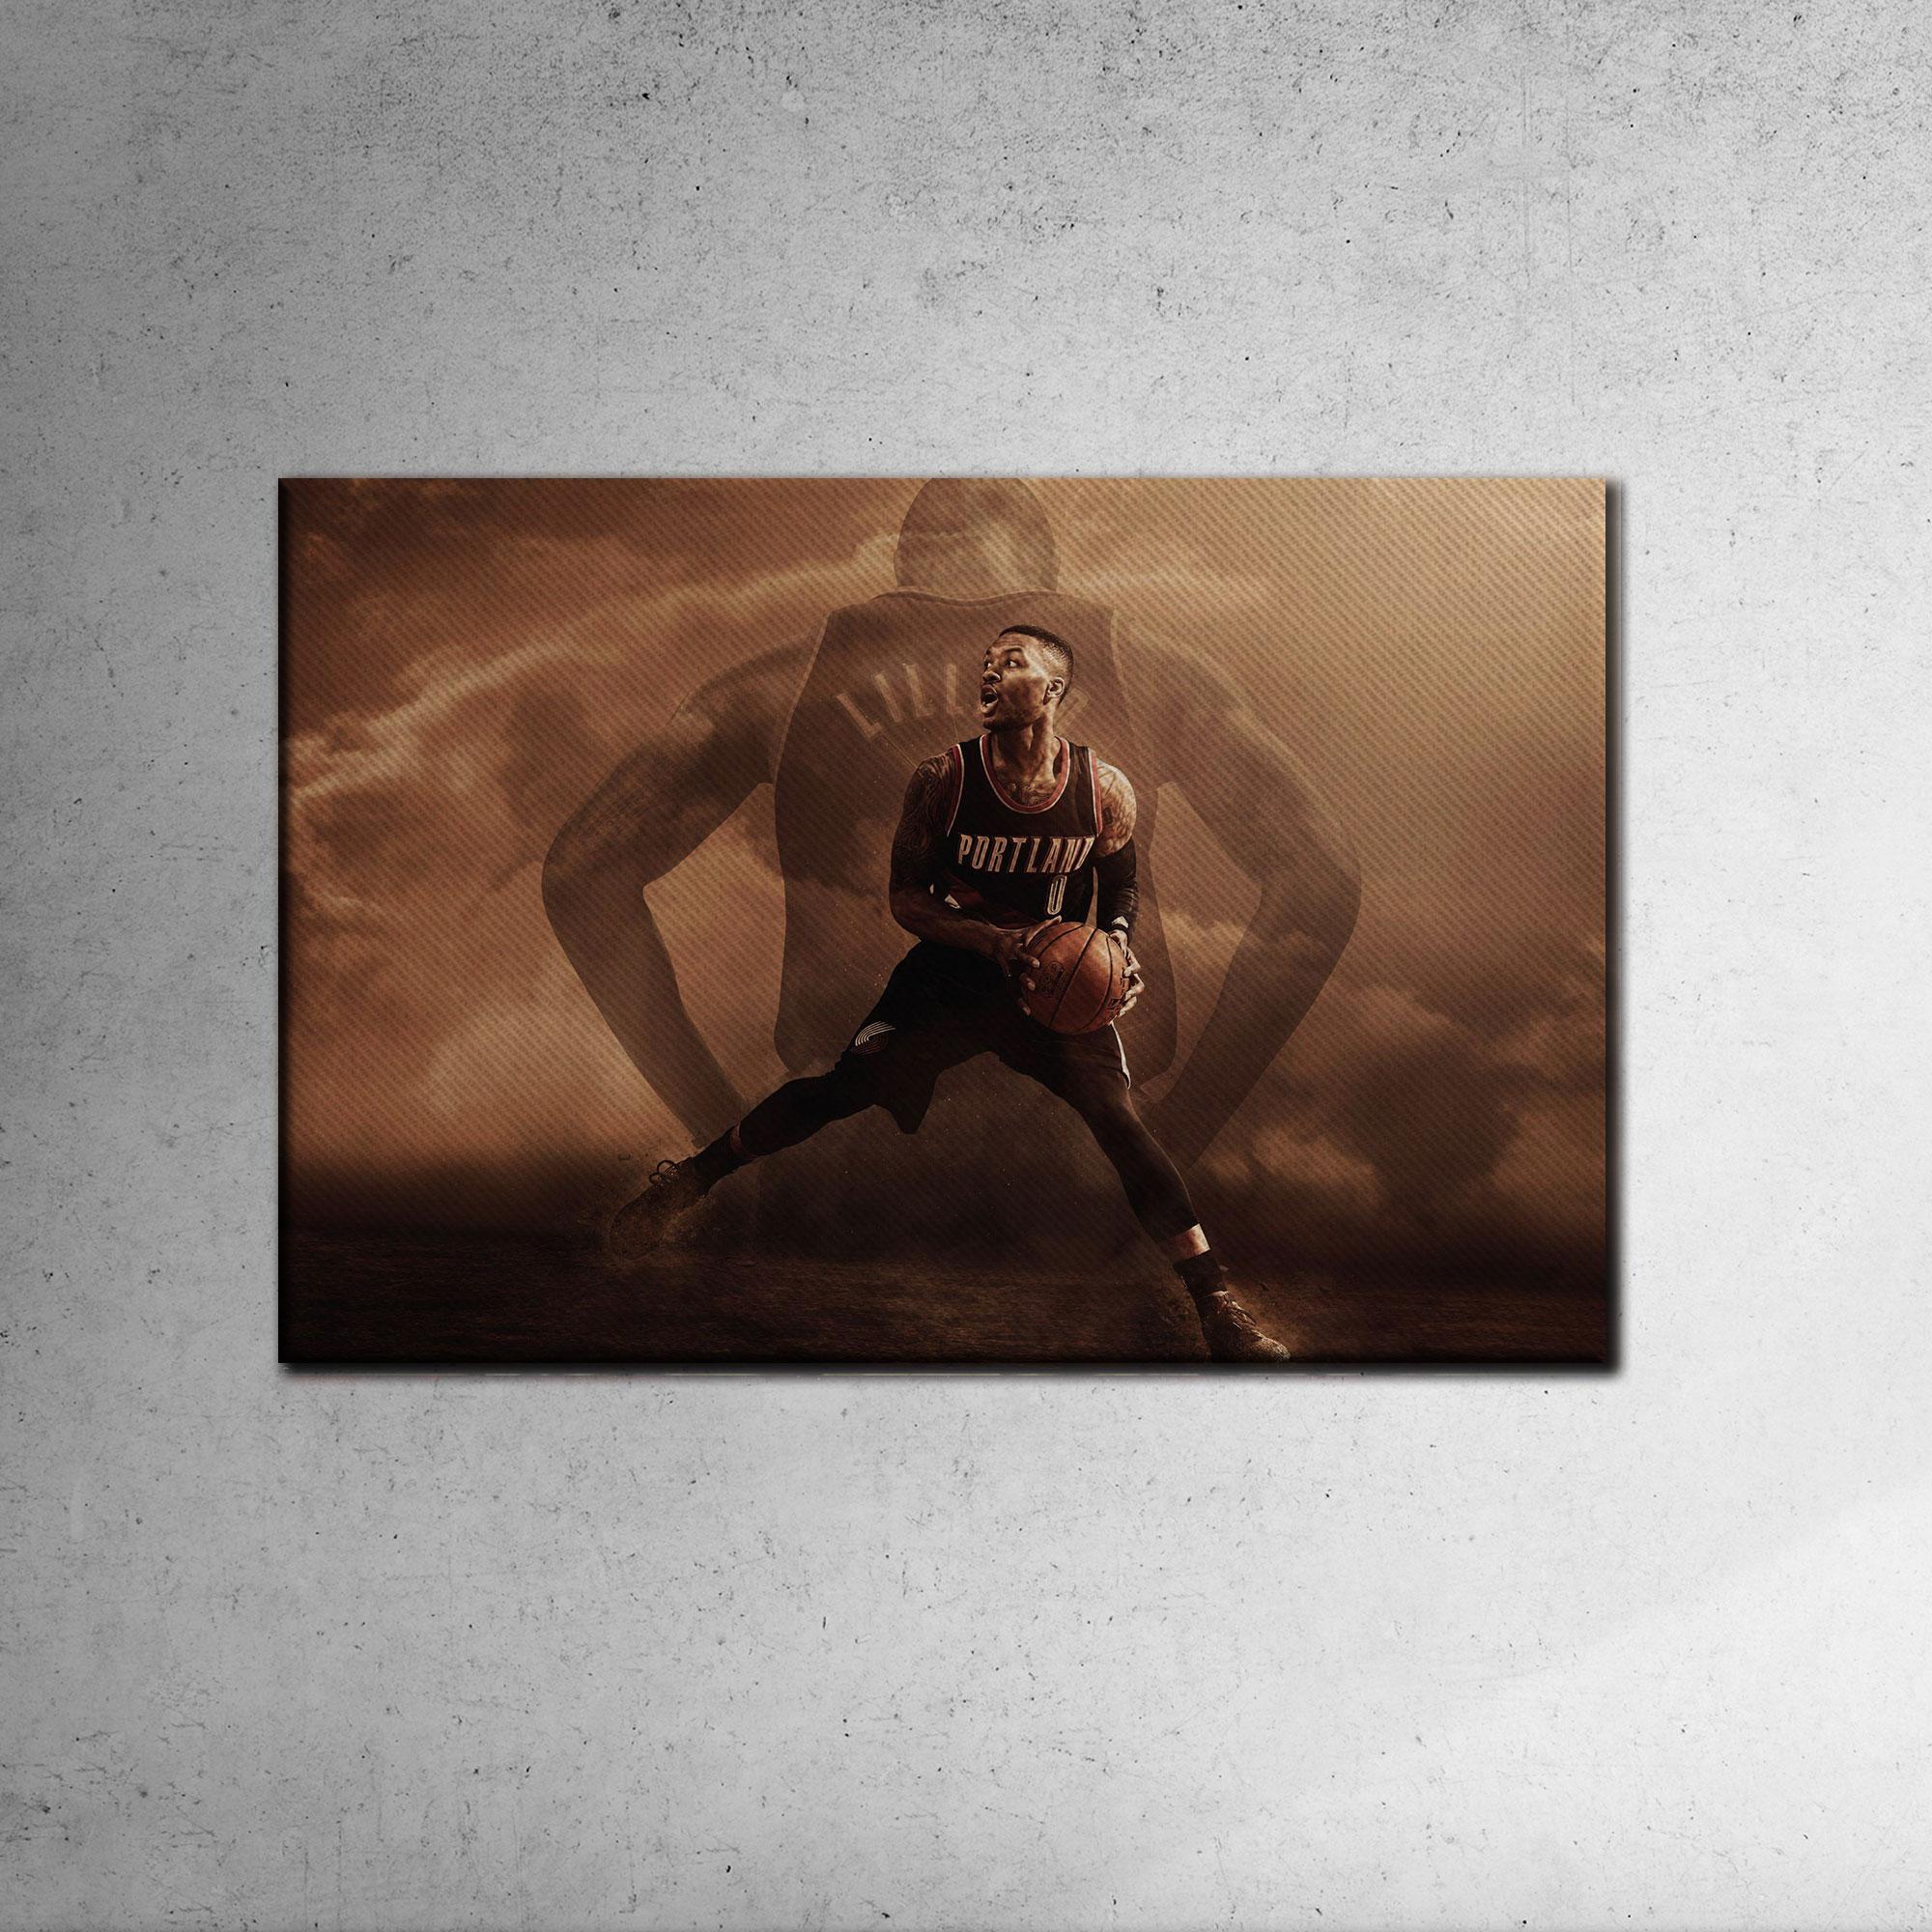 Damian Lillard Canvas Tablo (Nba-canvas-damian2)